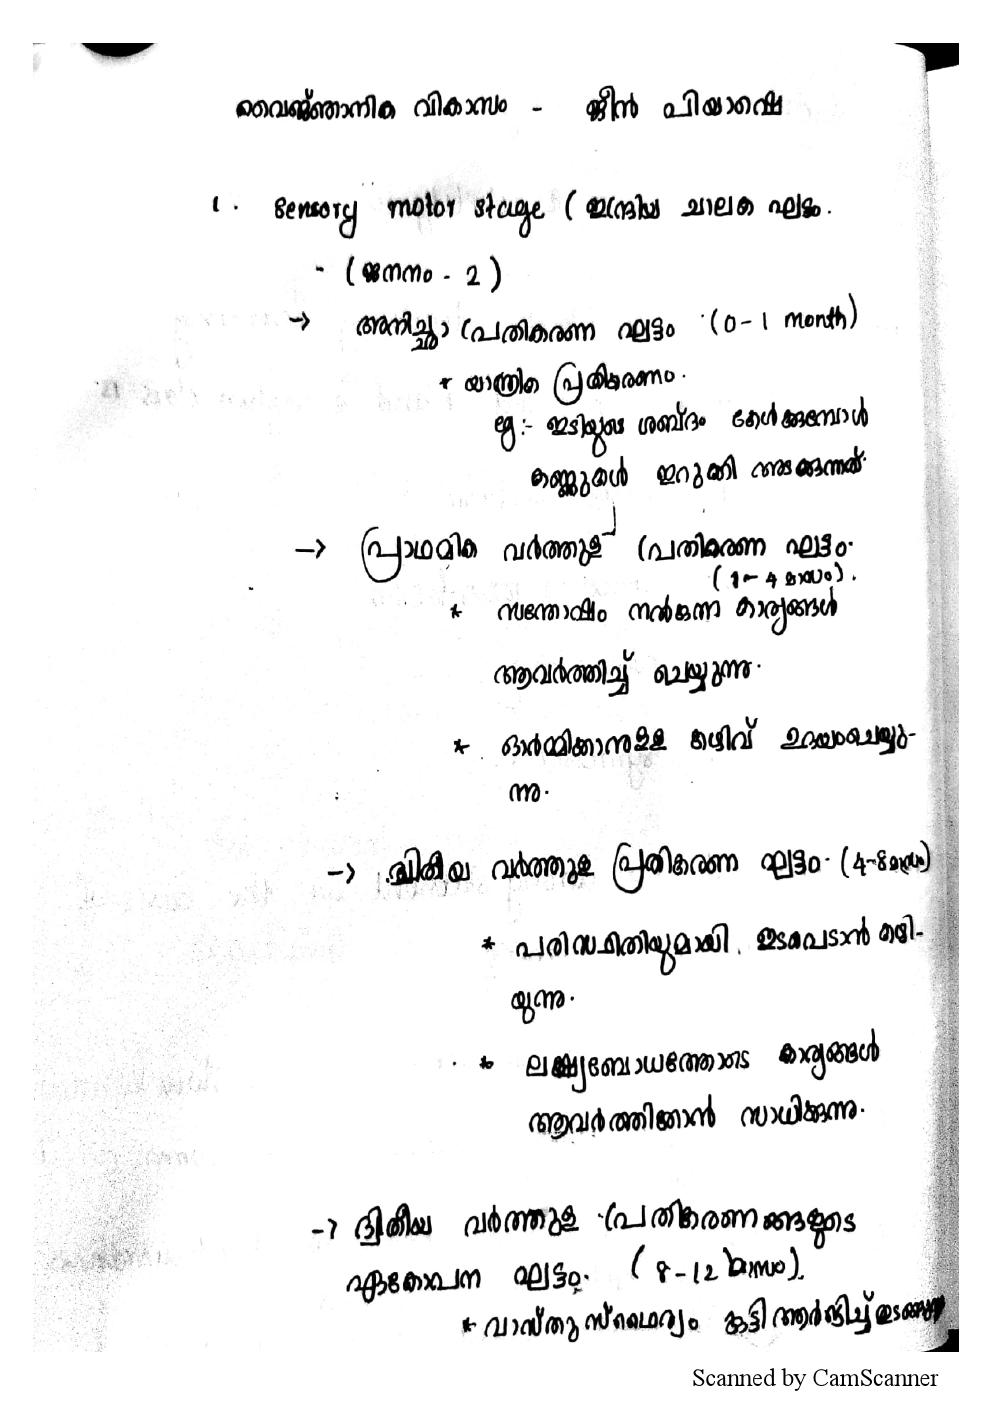 http://masterstudy.net/pdf/ktet_notes0075.png